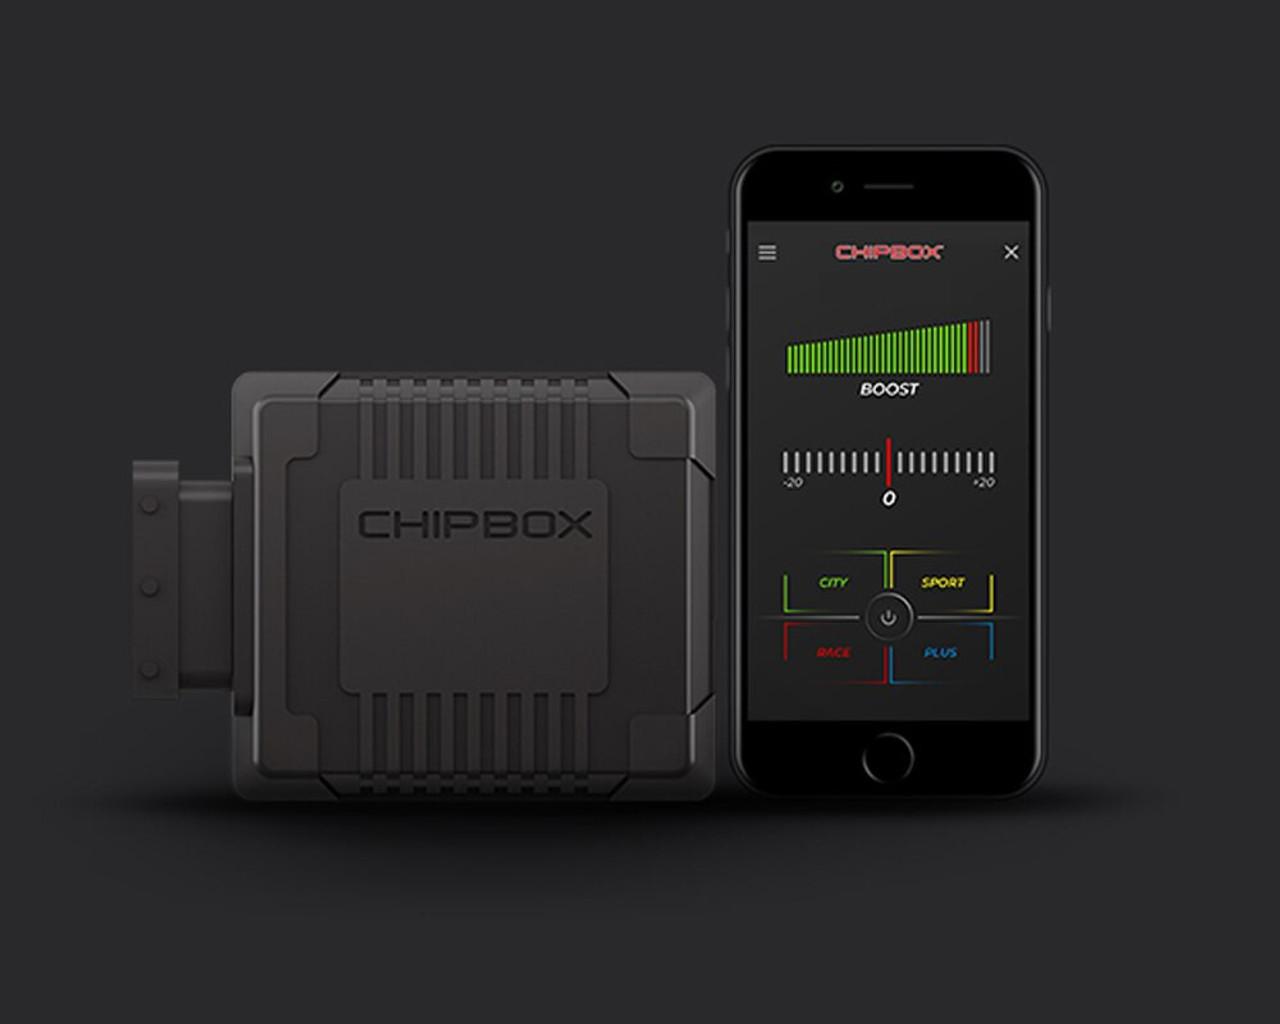 2017-on FIAT 124 Spider Chipbox Performance Unit Bluetooth version -Auto Ricambi